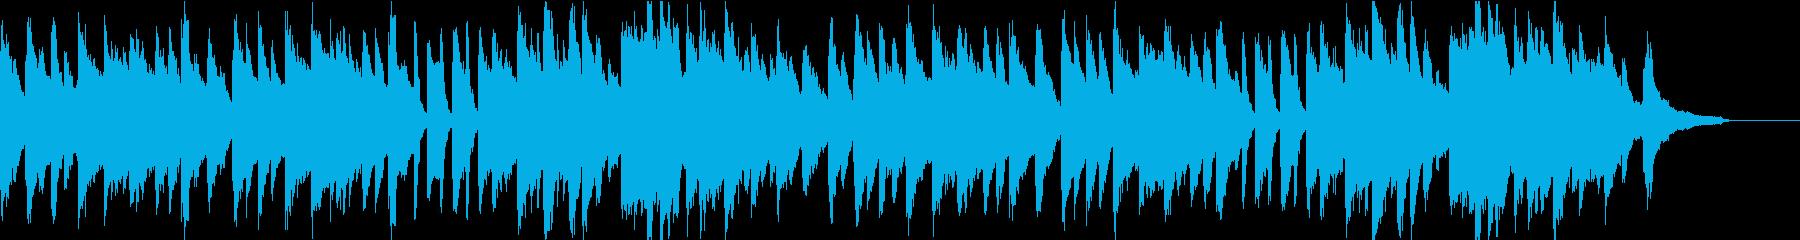 ABCの歌・きらきら星 ピアノ伴奏の再生済みの波形